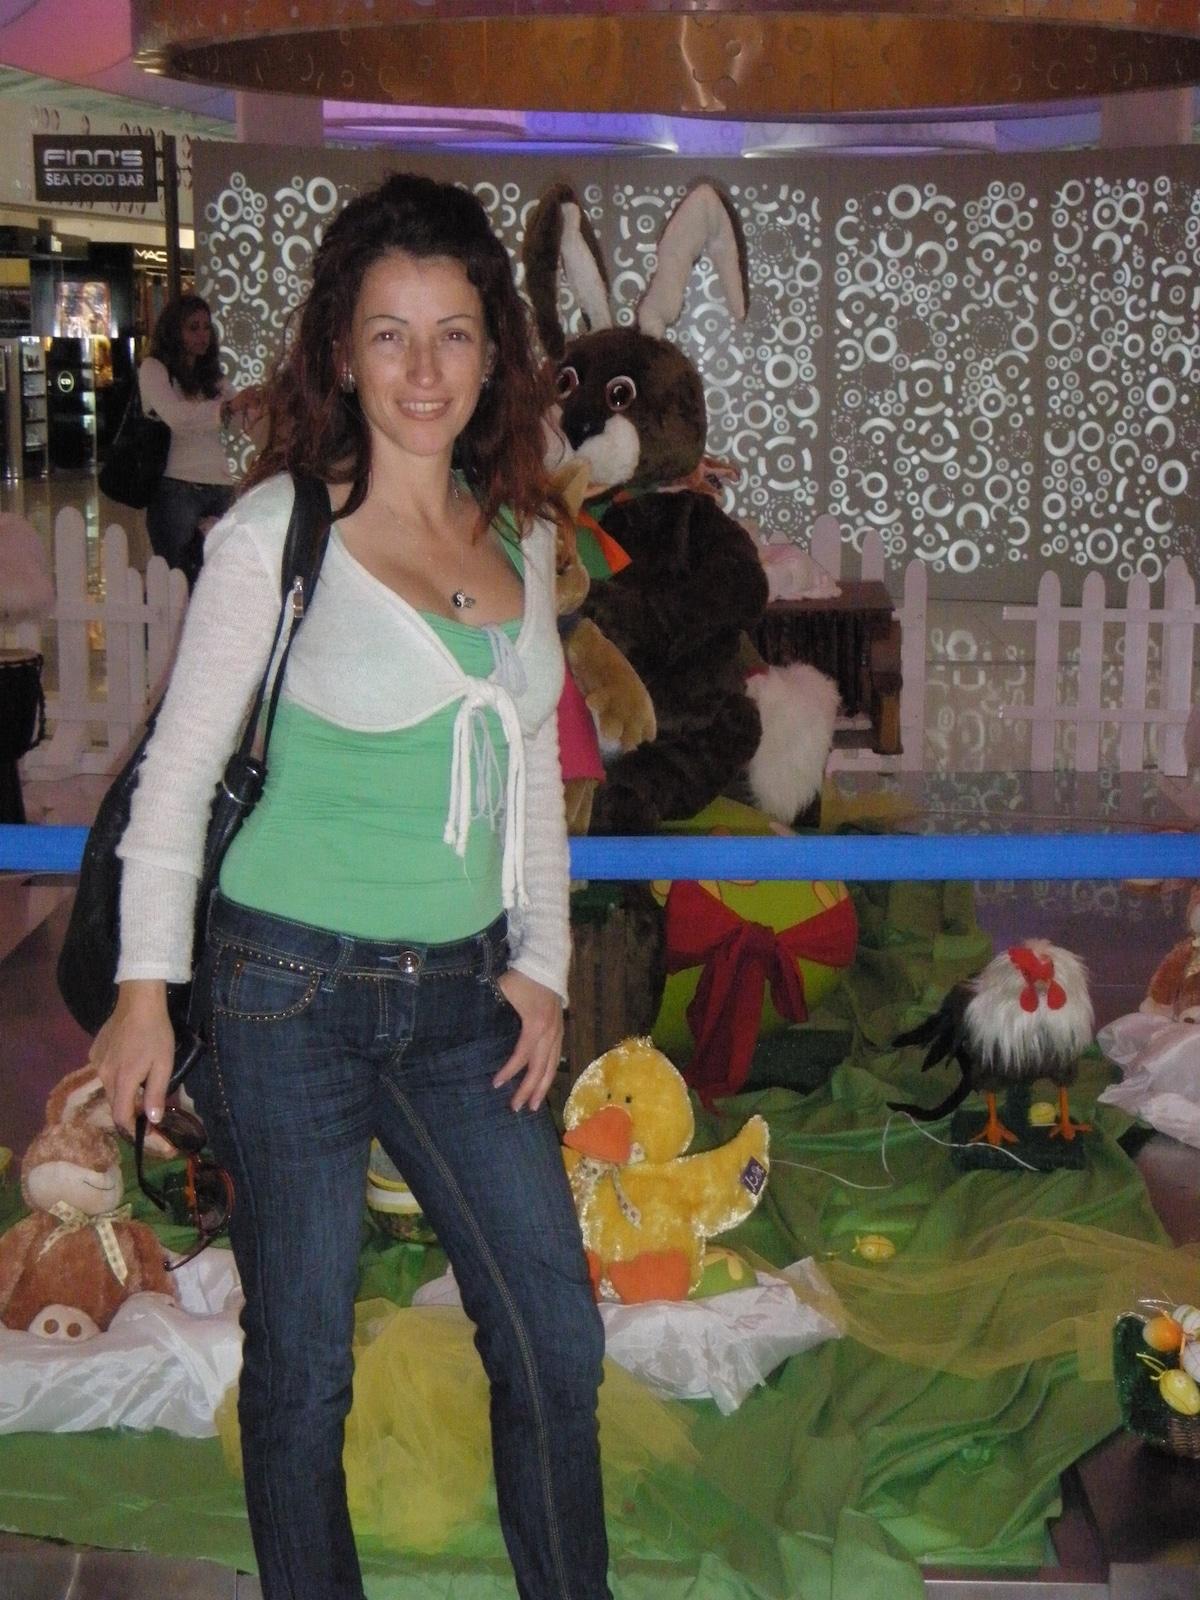 Nadejda from Nicosia